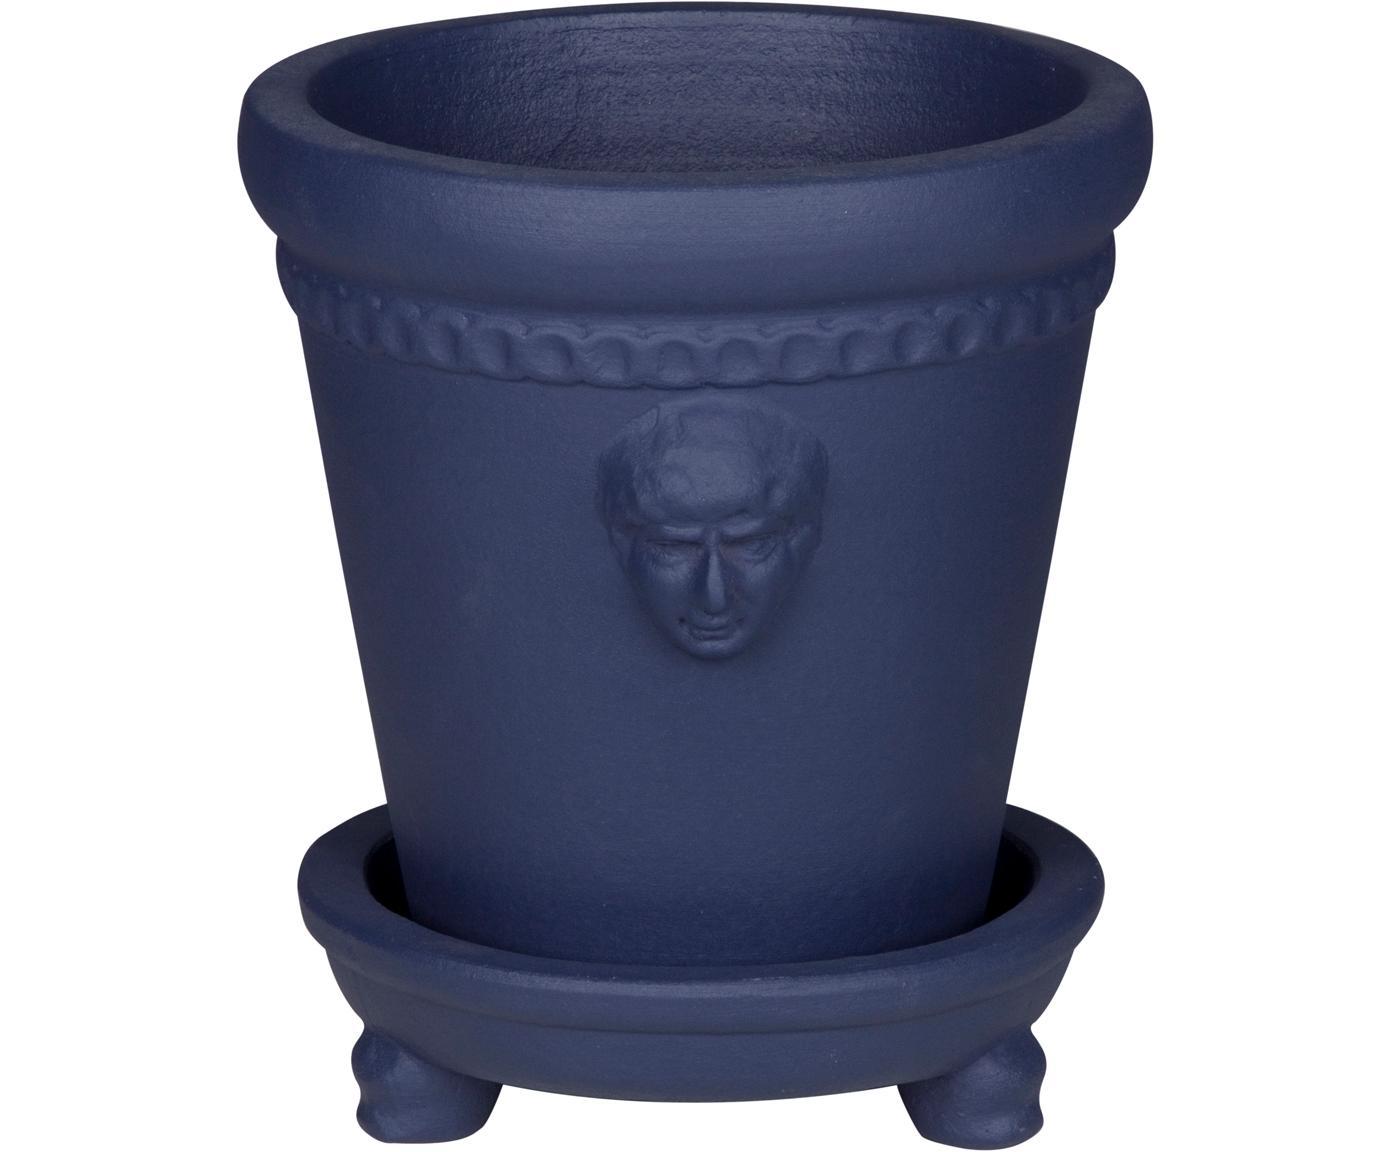 Übertopf Ceasar, Terrakotta, Blau, Ø 17 x H 20 cm